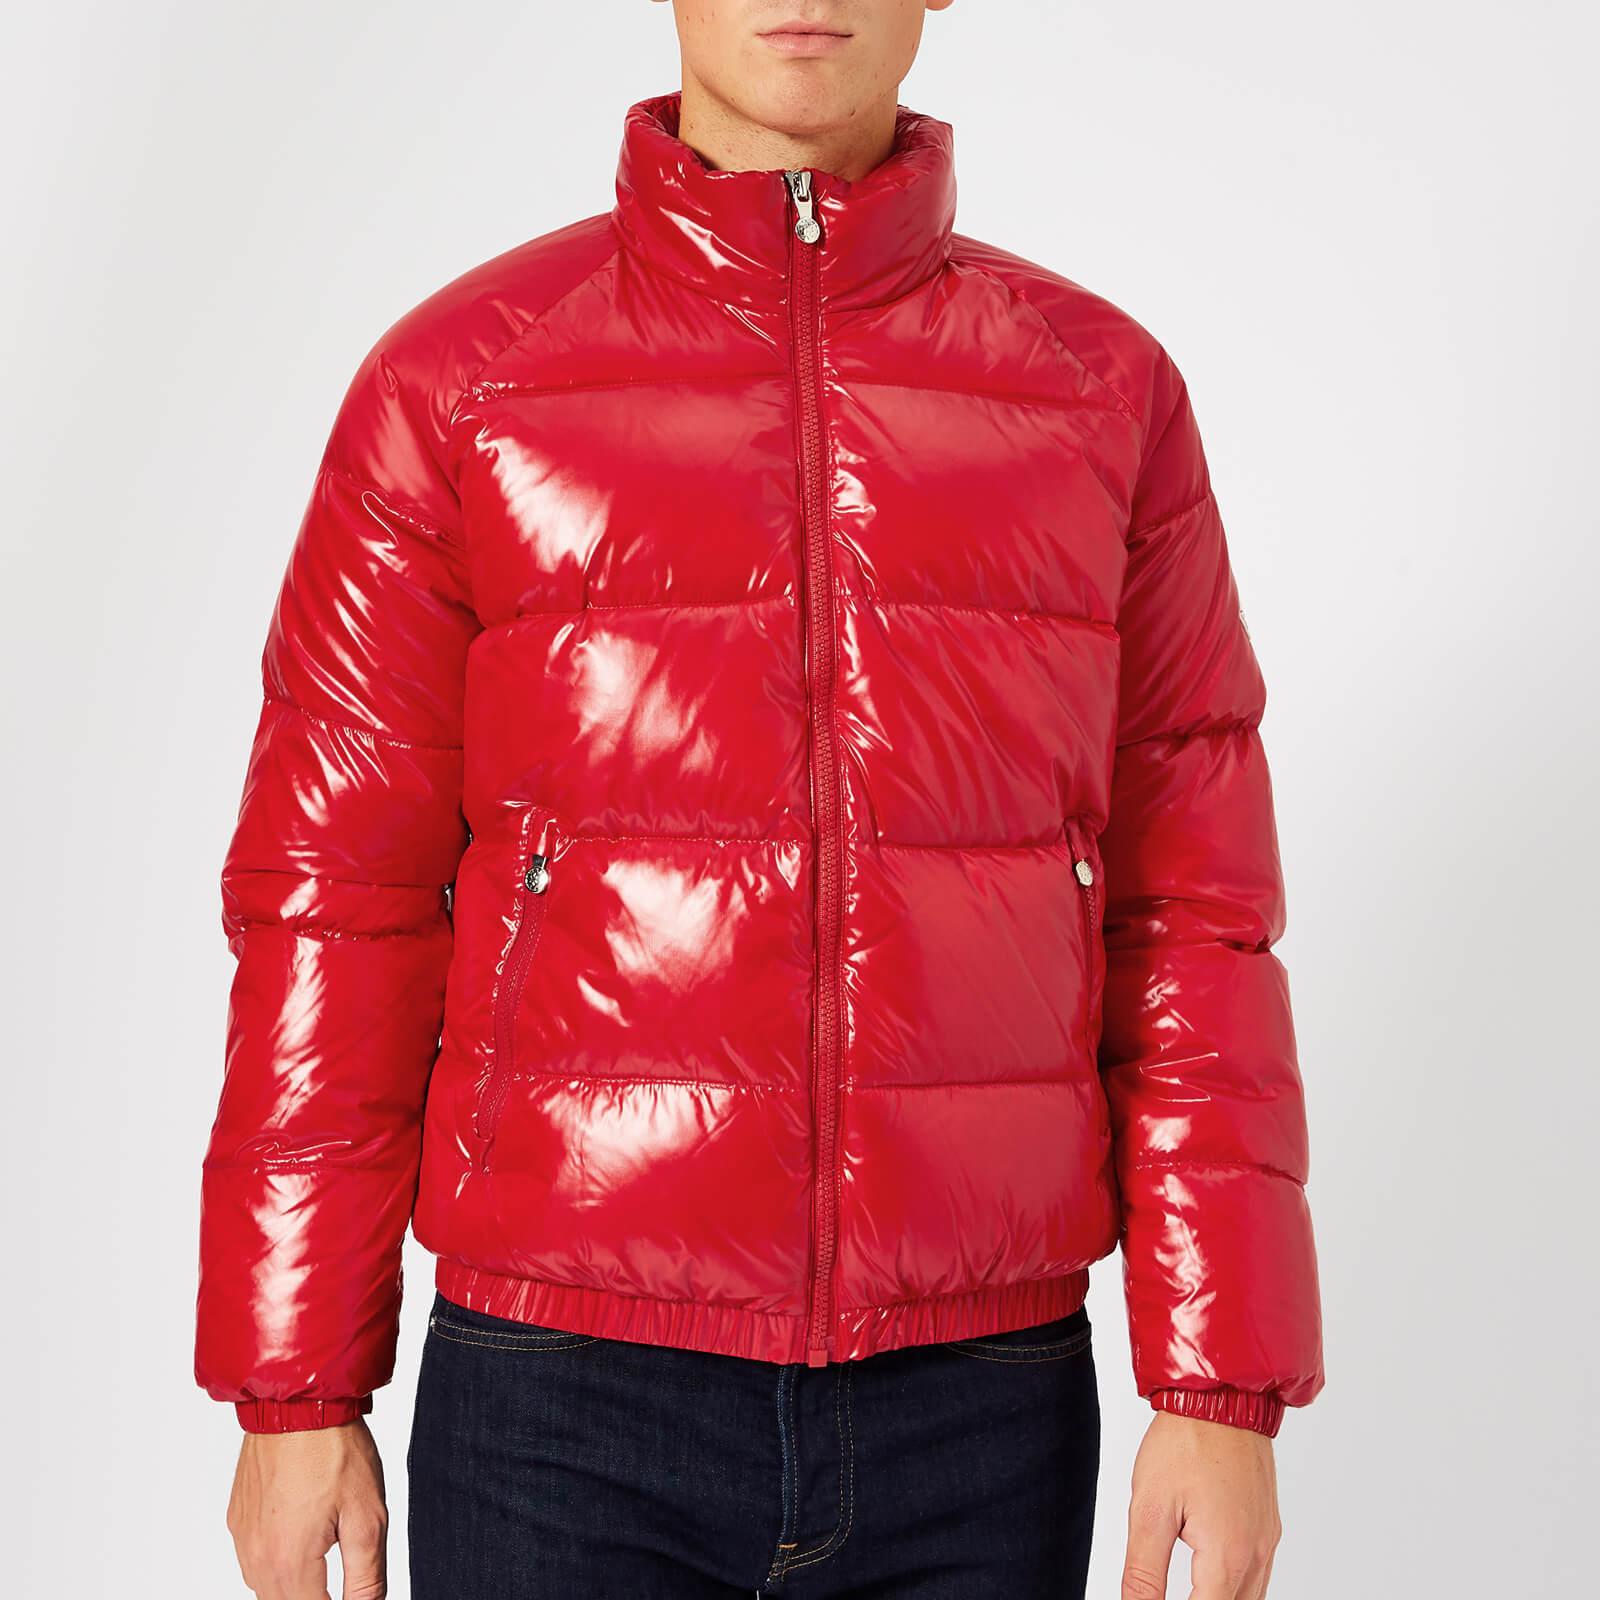 Pyrenex Men's Vintage Mythik Jacket Shiny - Rouge - L - Red